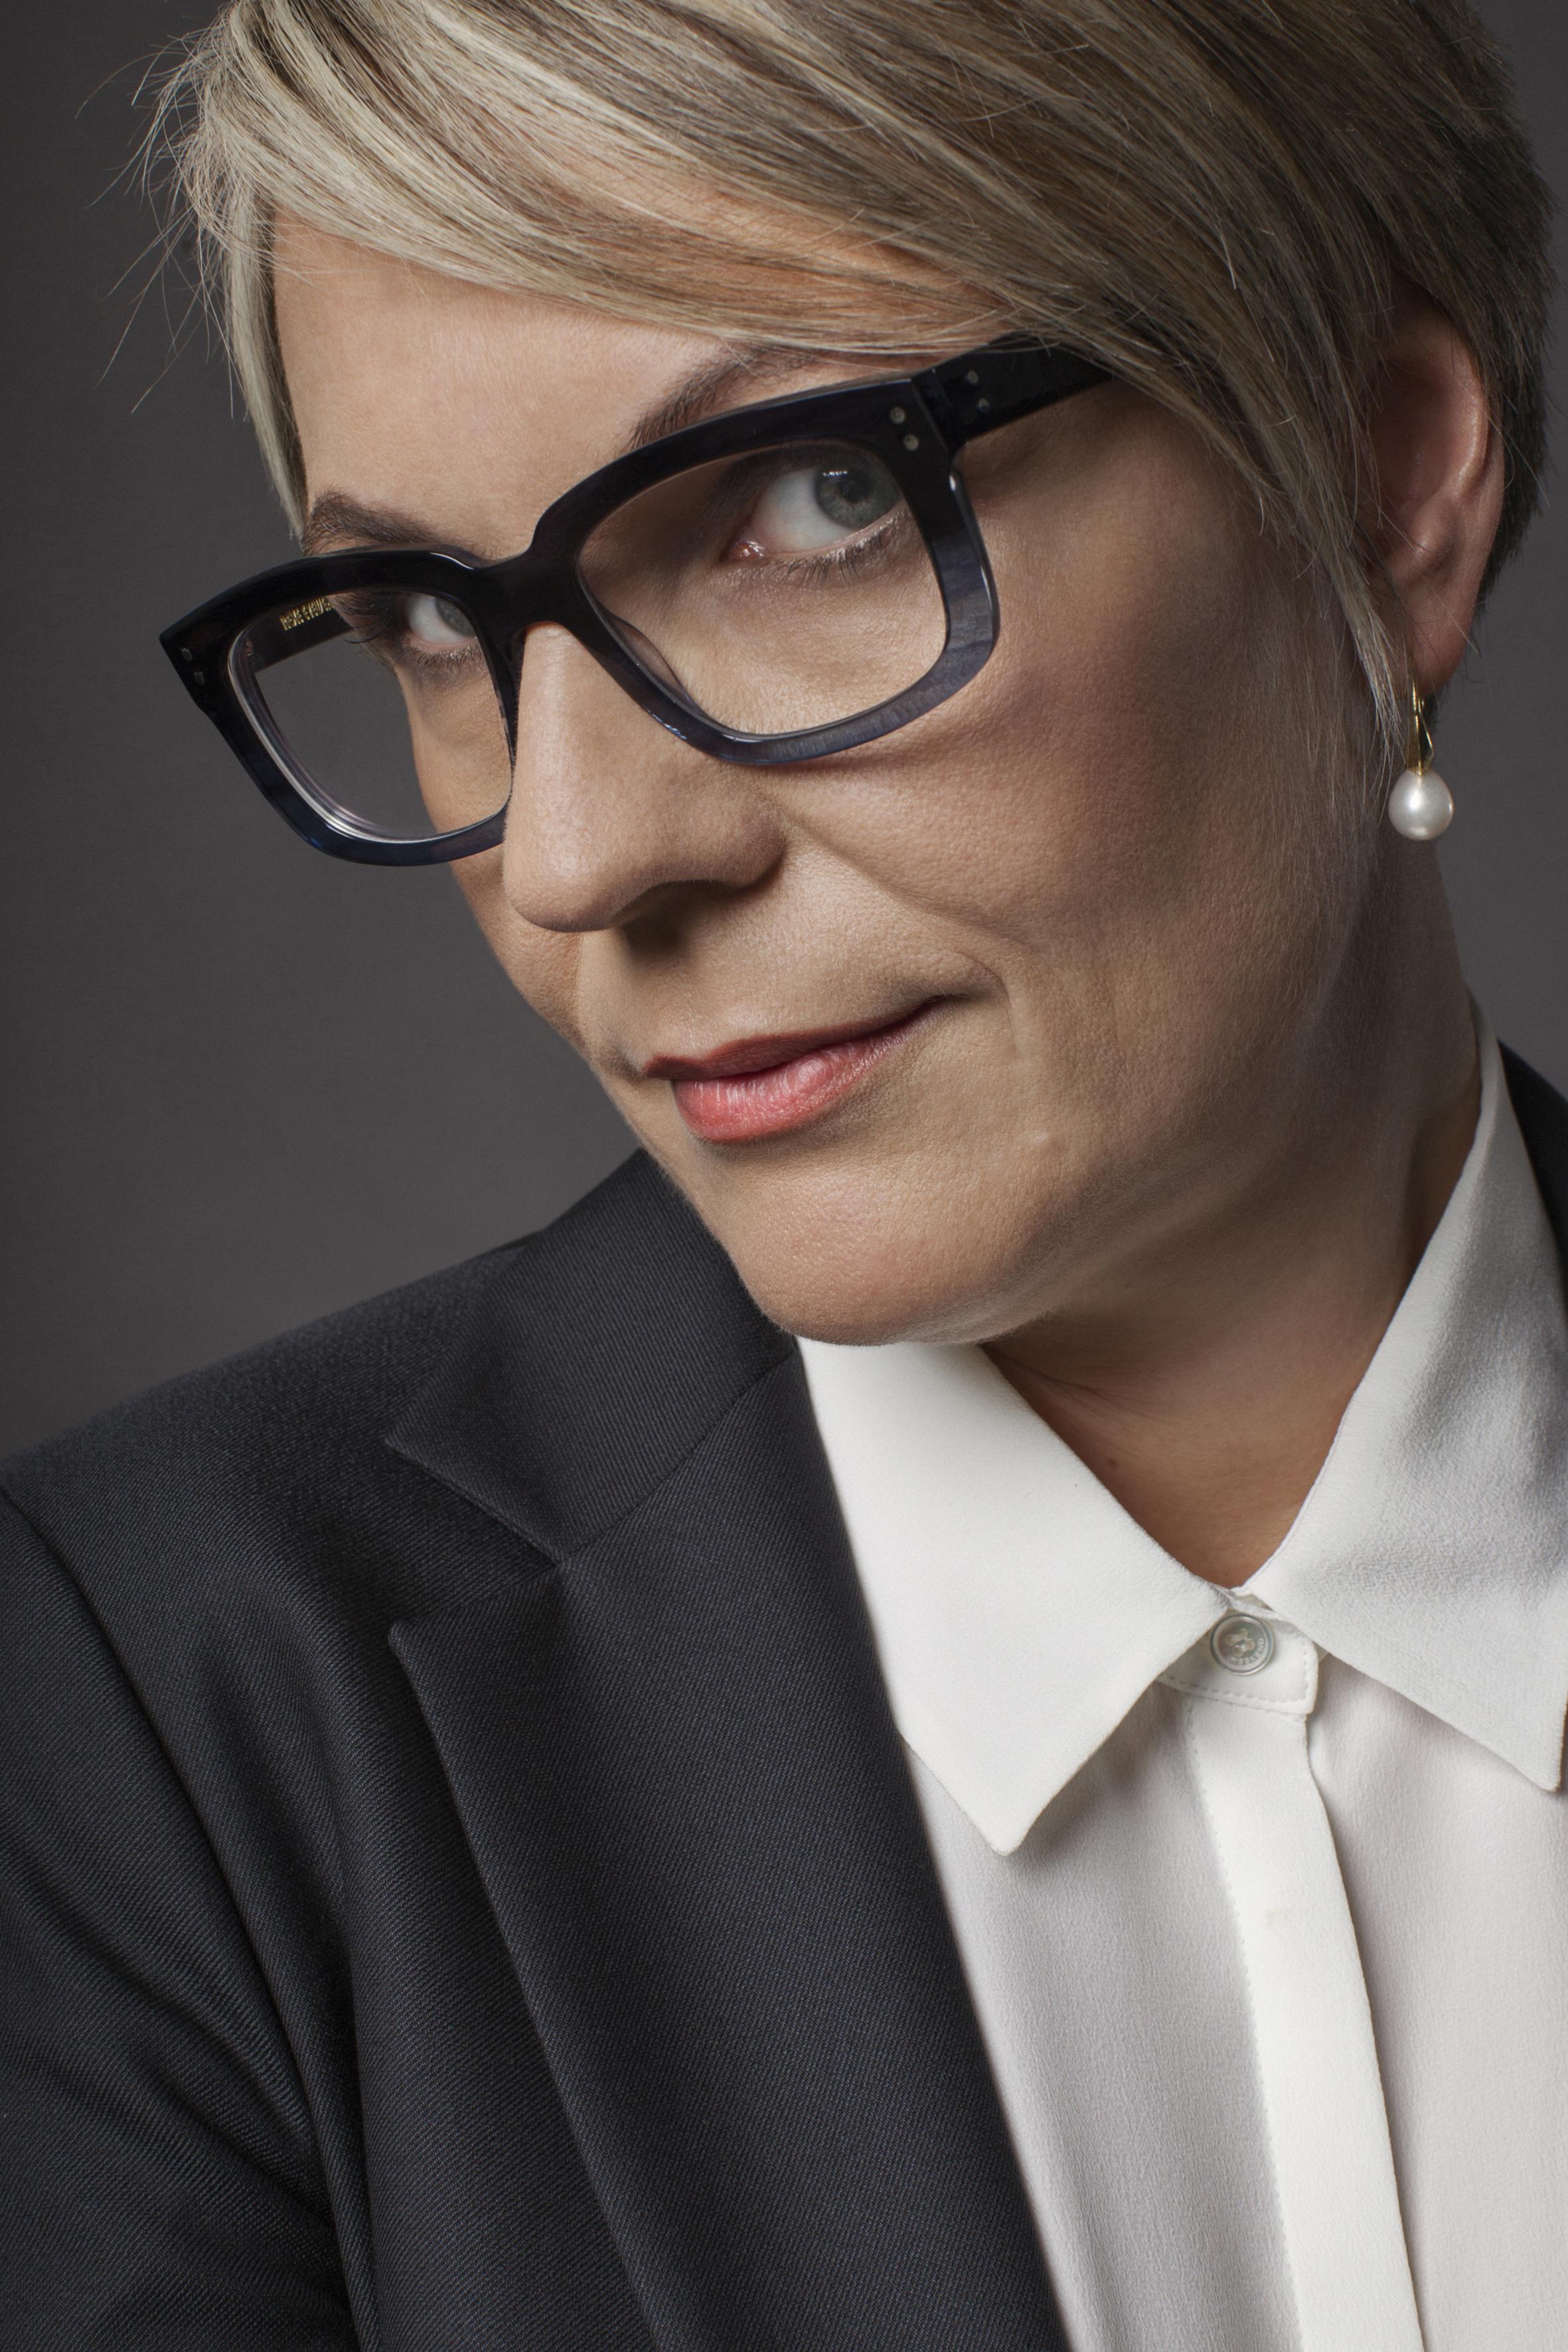 Deputy Leader of the Opposition -Tanya Plibersek